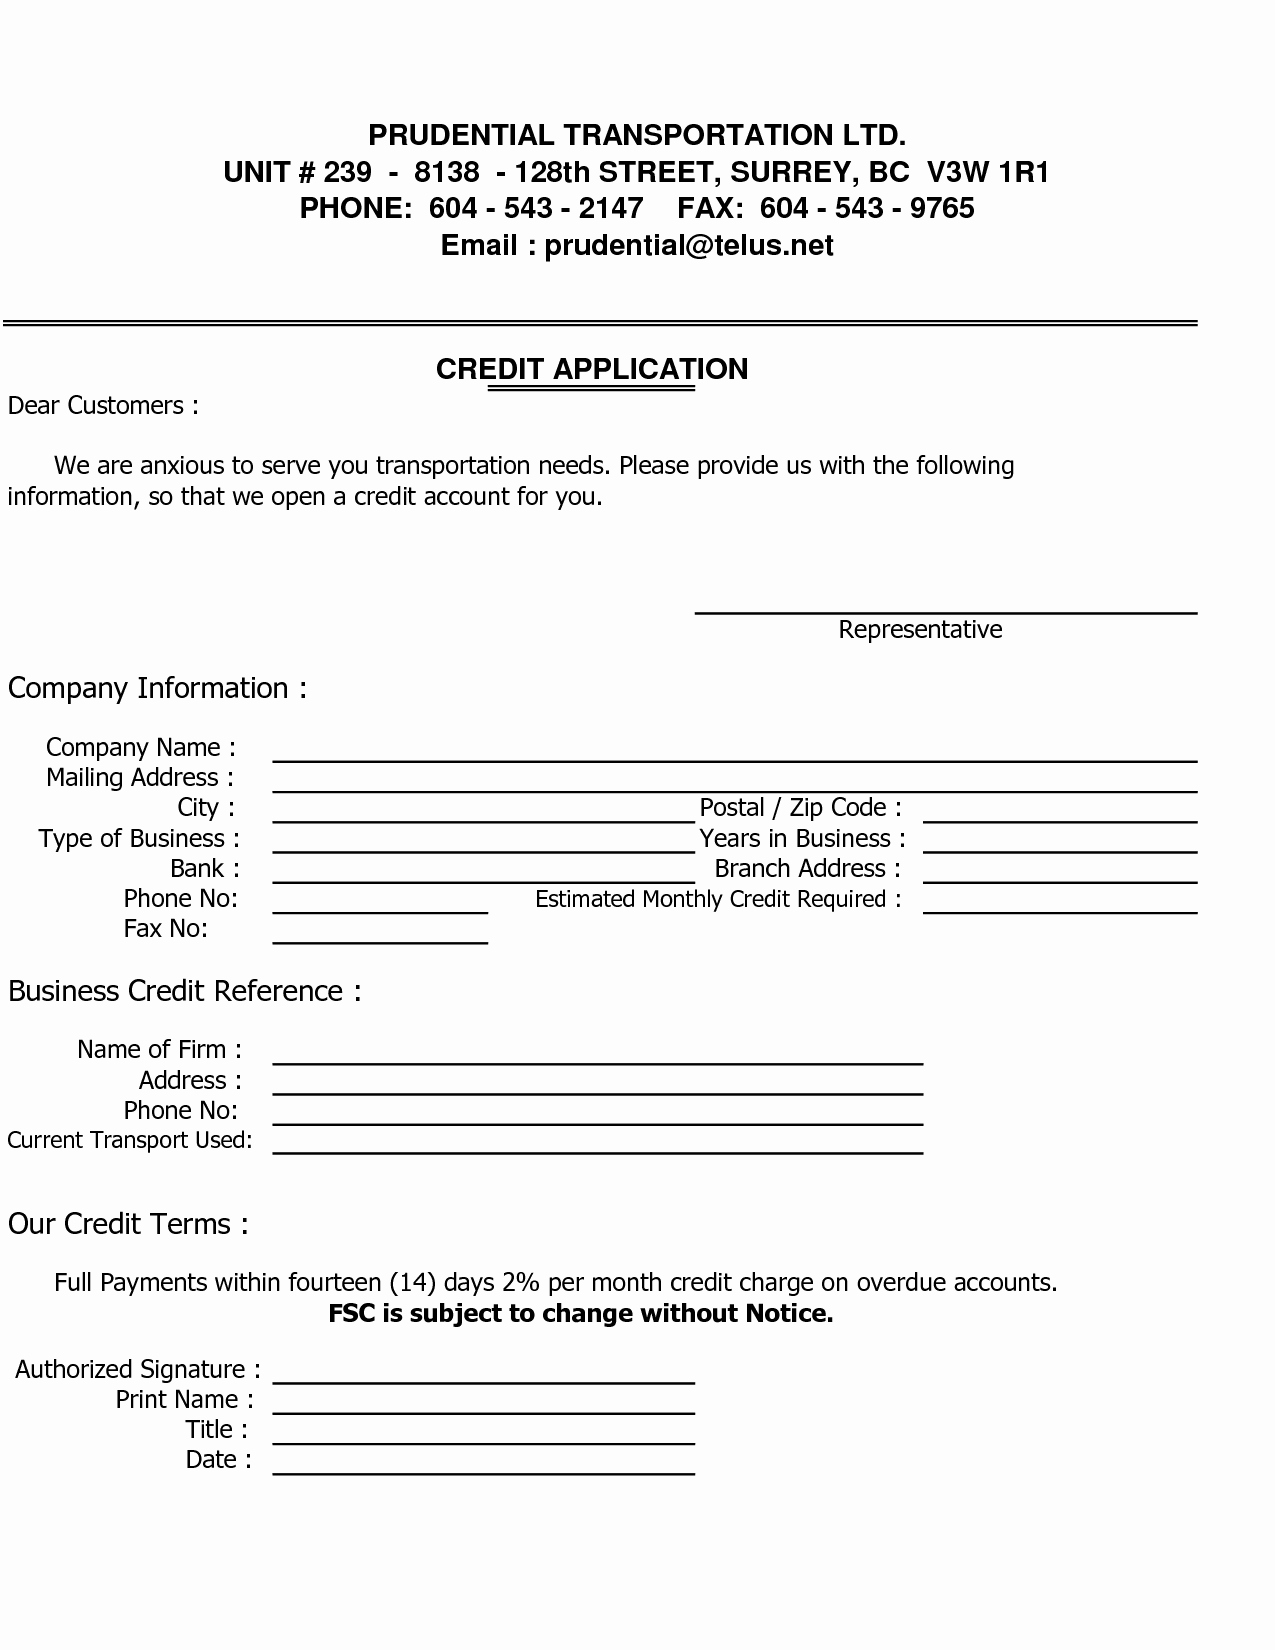 Business Reference Letter Template Elegant Sample Credit Reference Letter Template Images Business